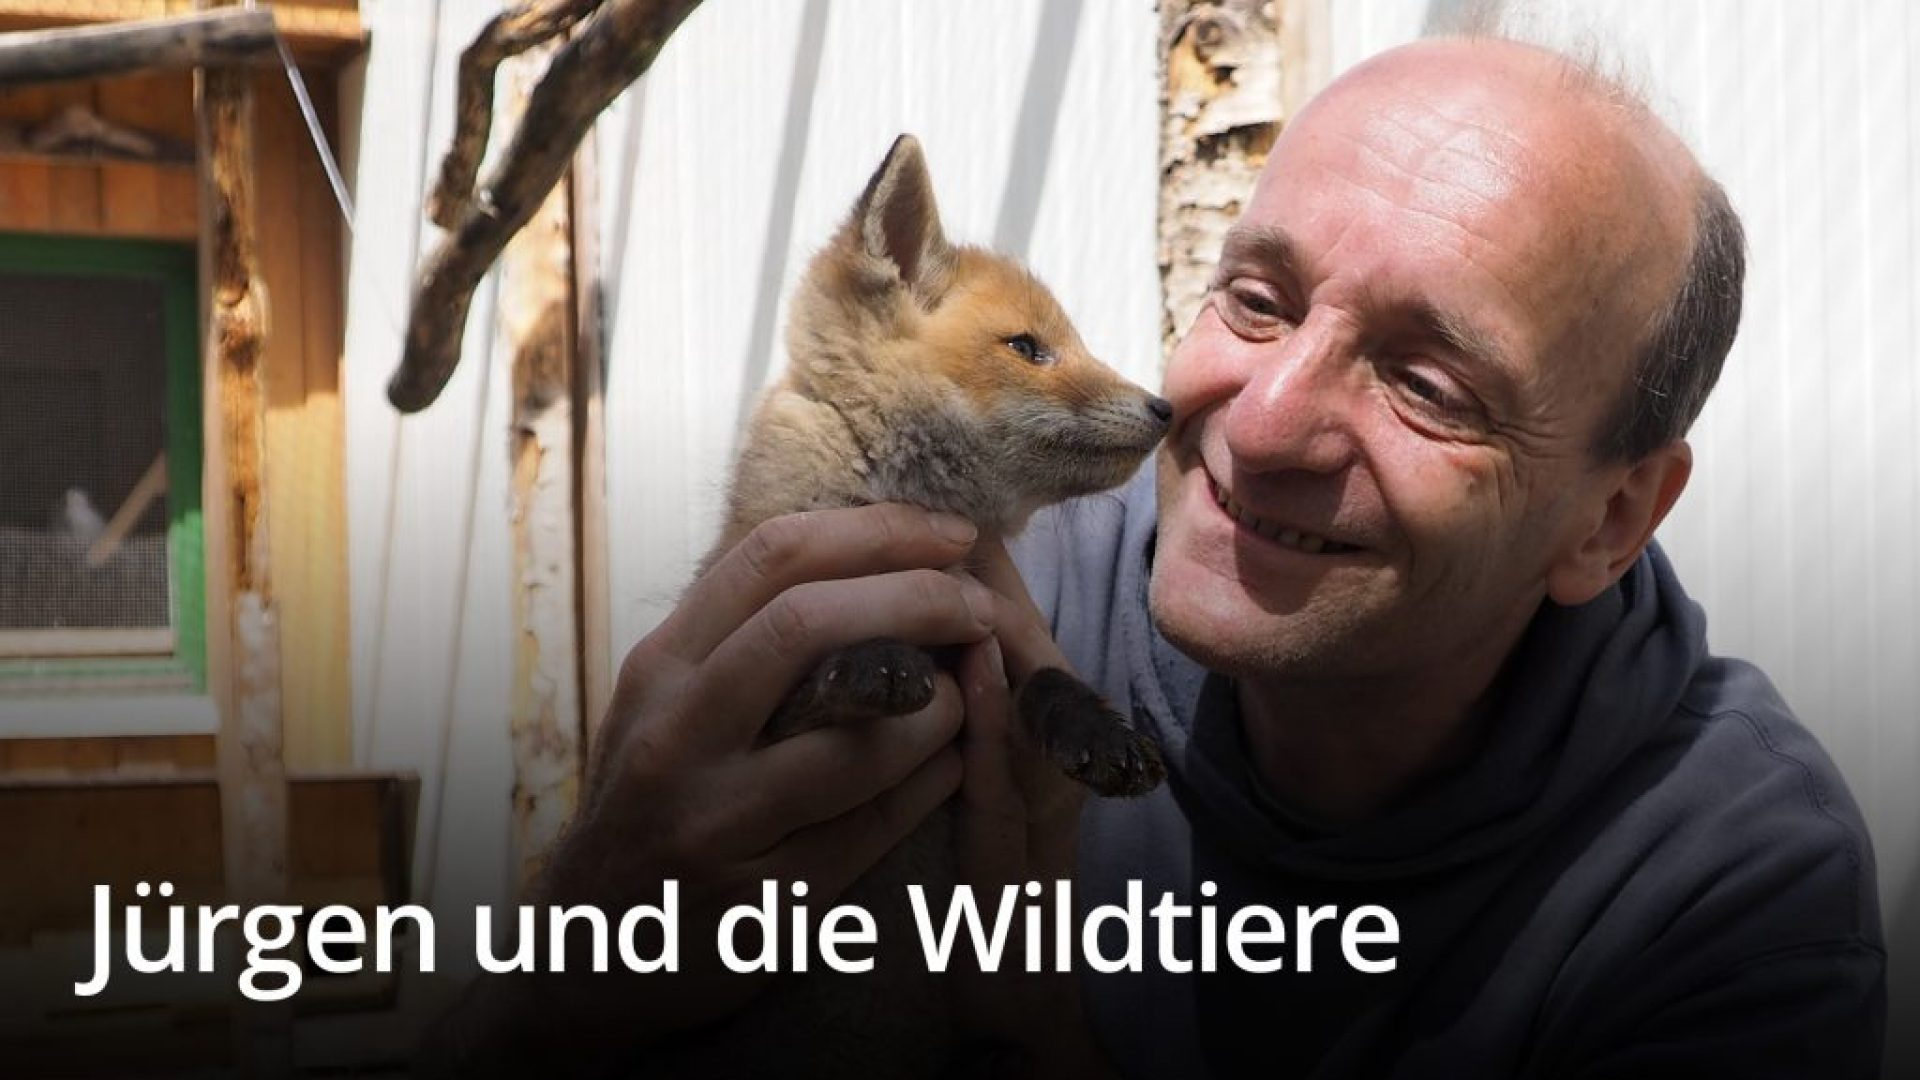 Saving the wild animals